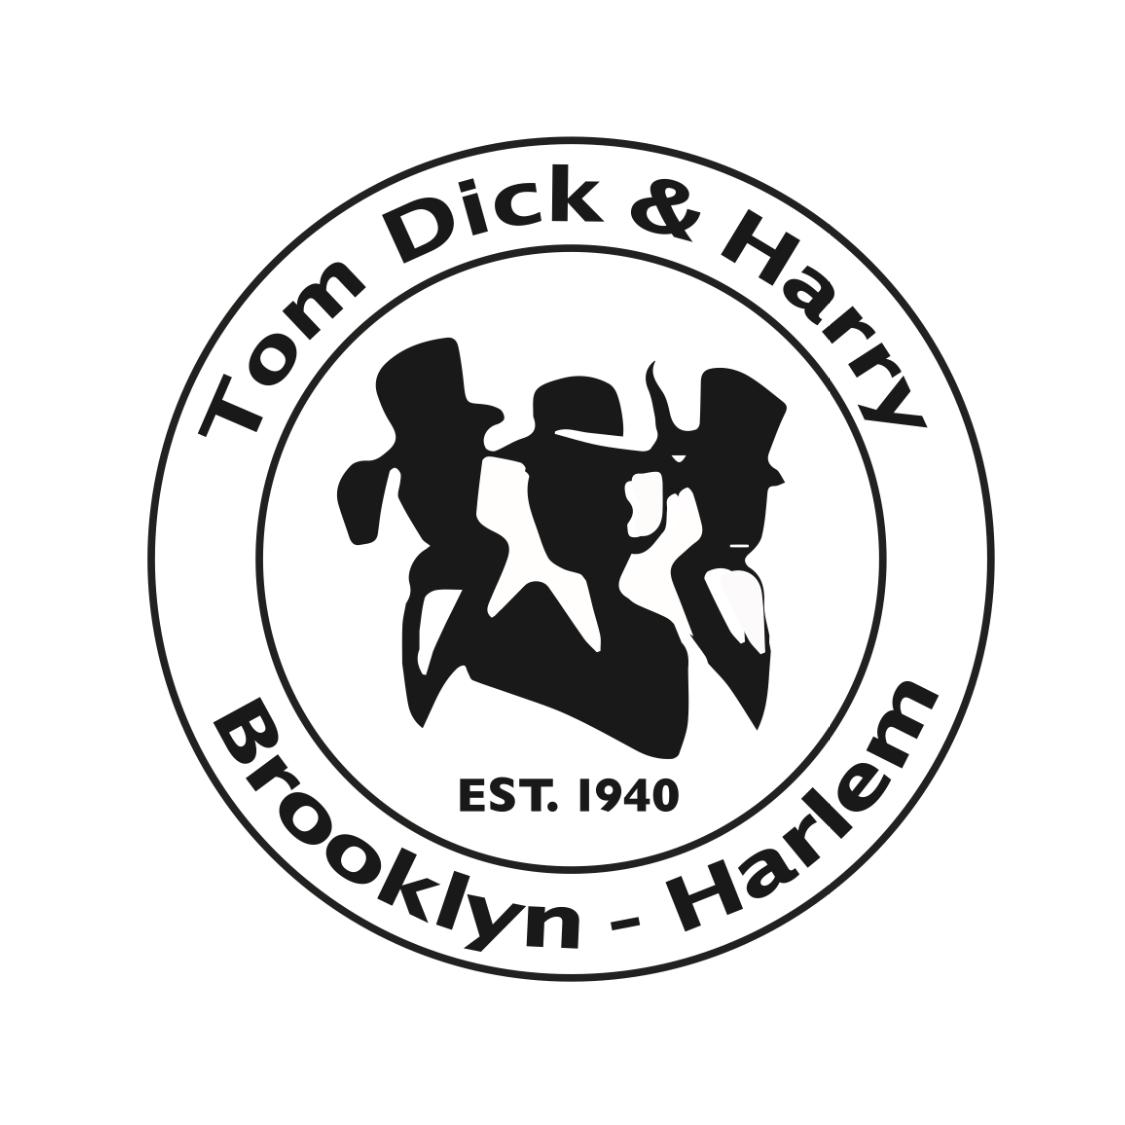 Tom Dick & Harry's Sneakers